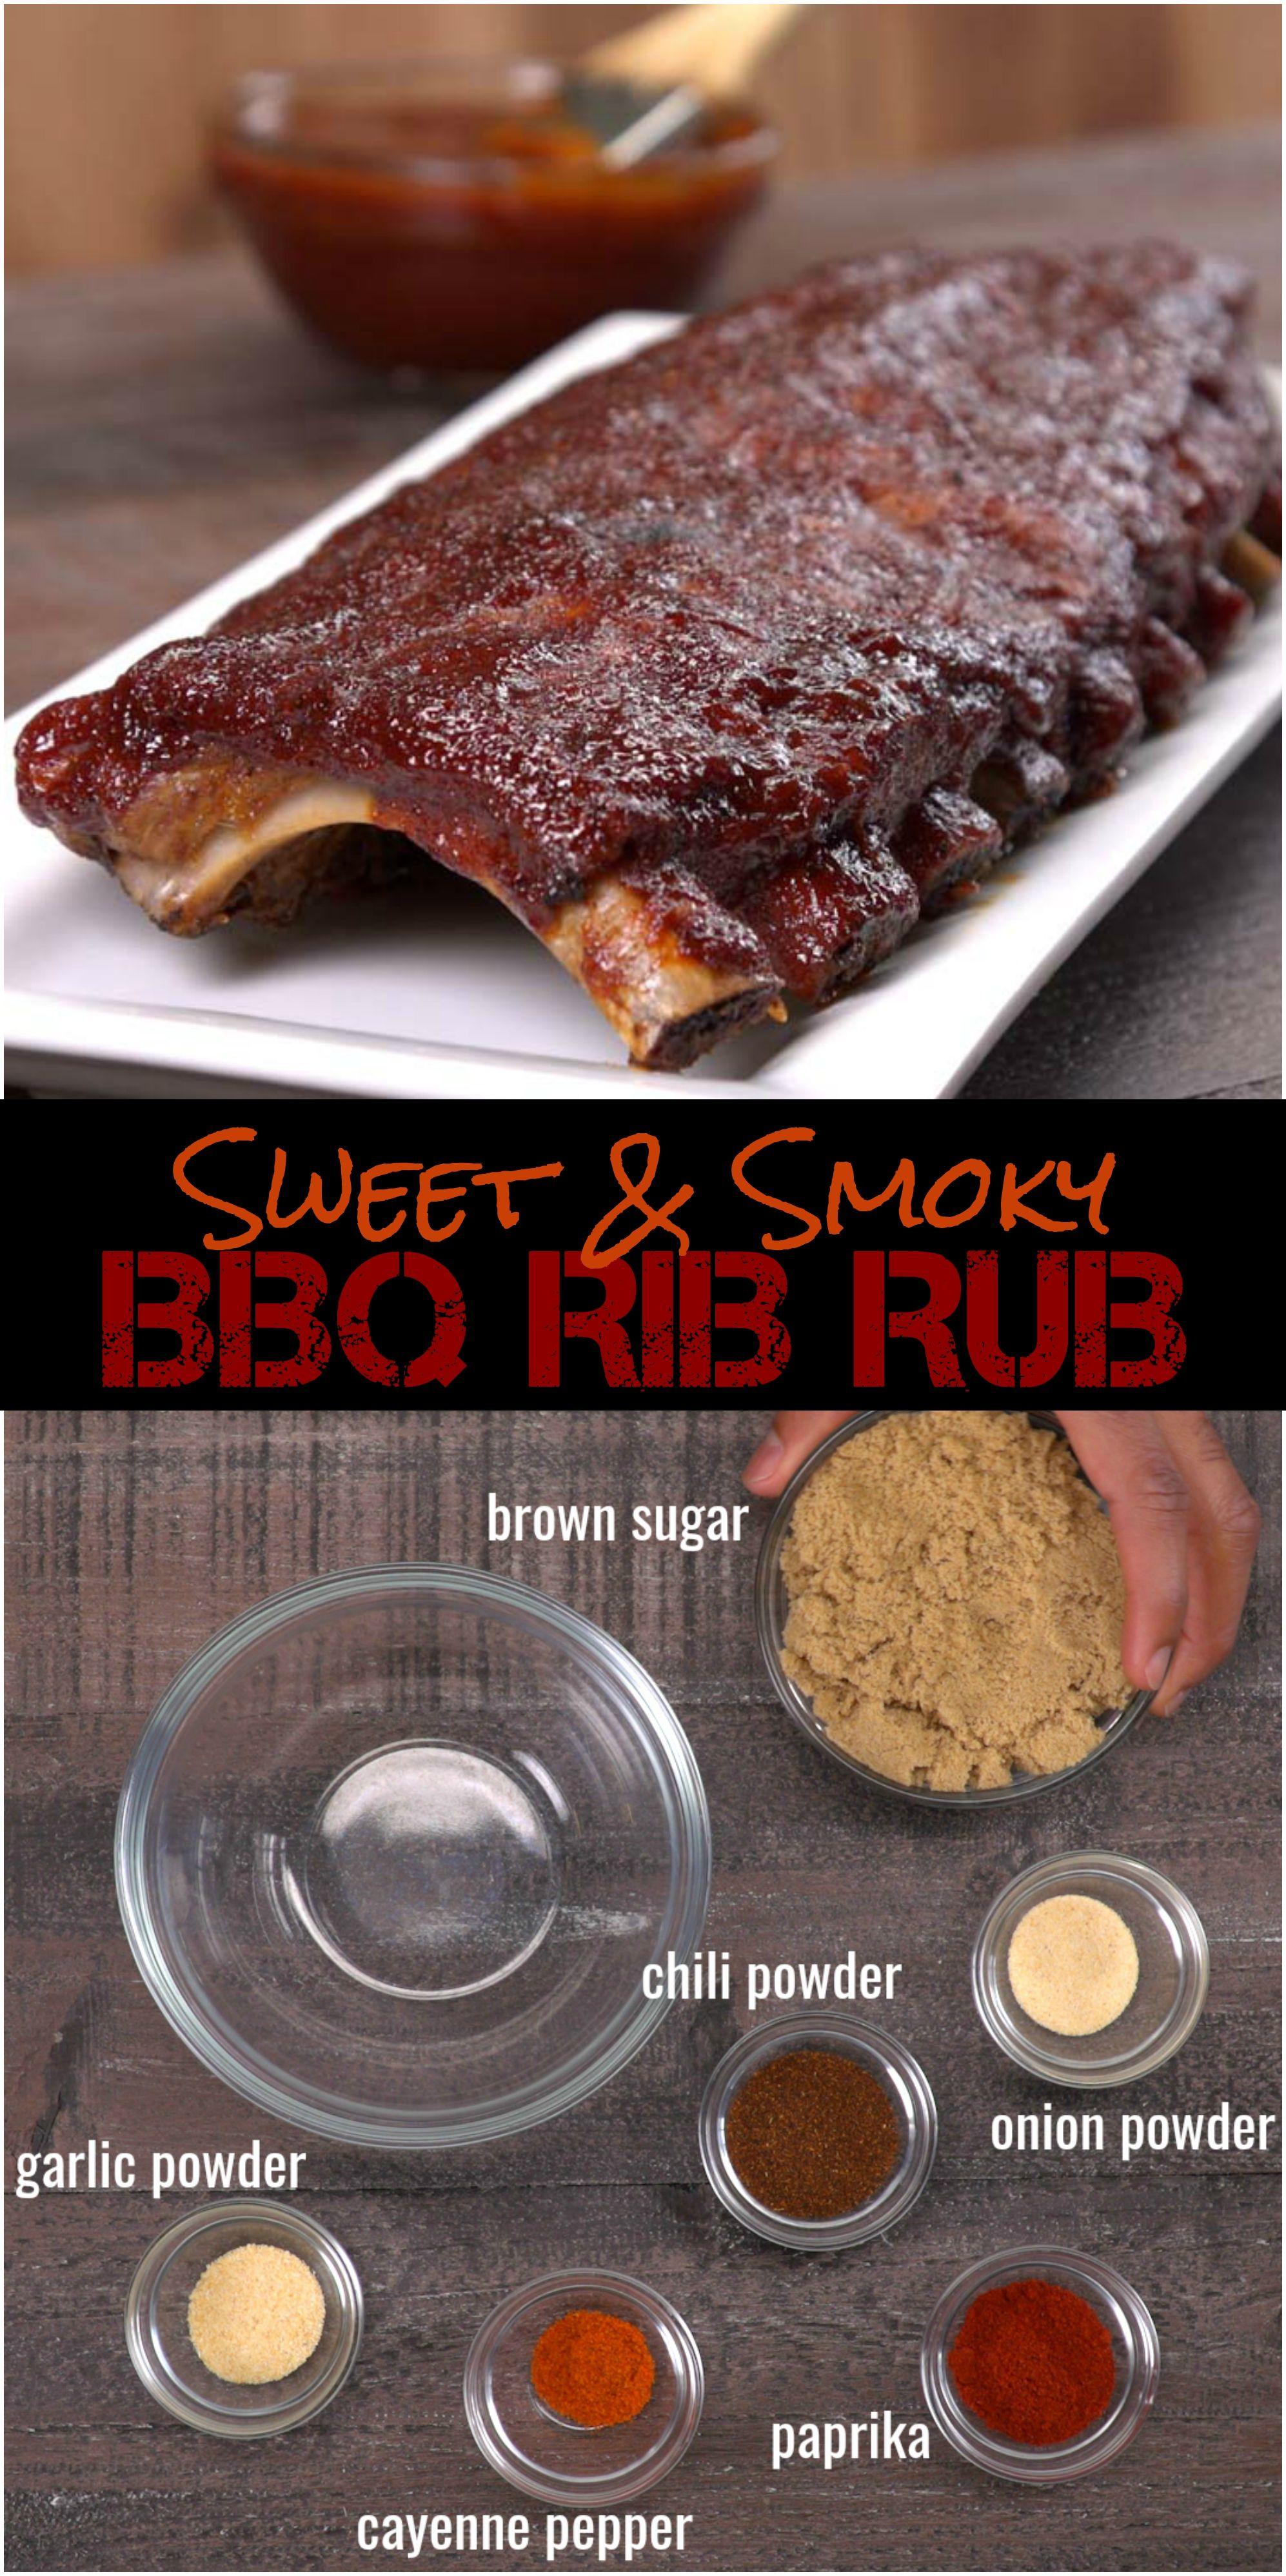 Oven Baked BBQ Ribs with Homemade Rib Rub & BBQ Sauce